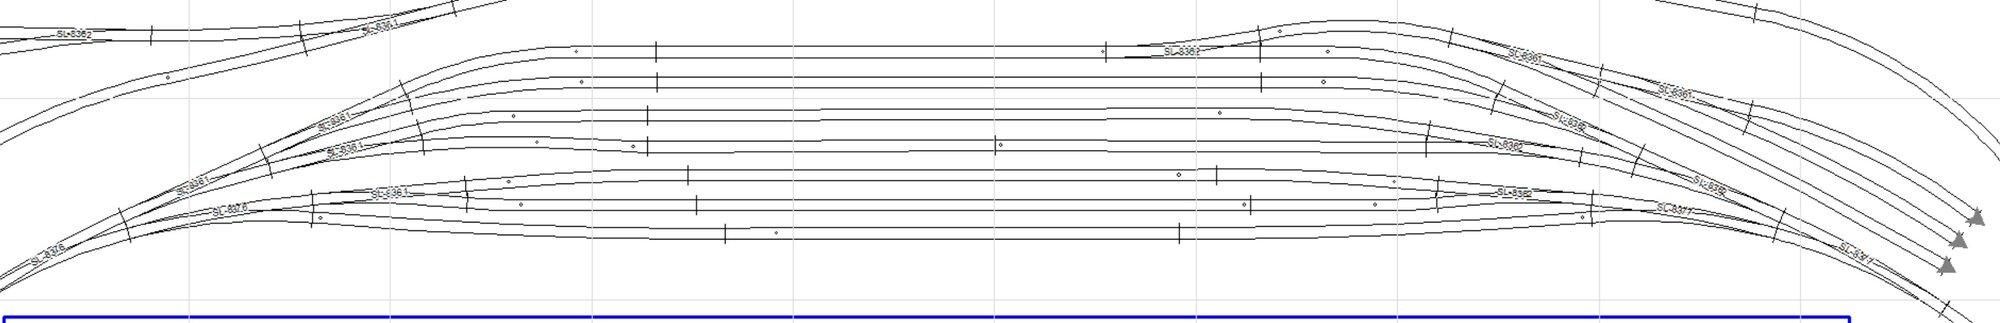 Trackplan DRAFT_North Yard 11 3.20.2021.jpg